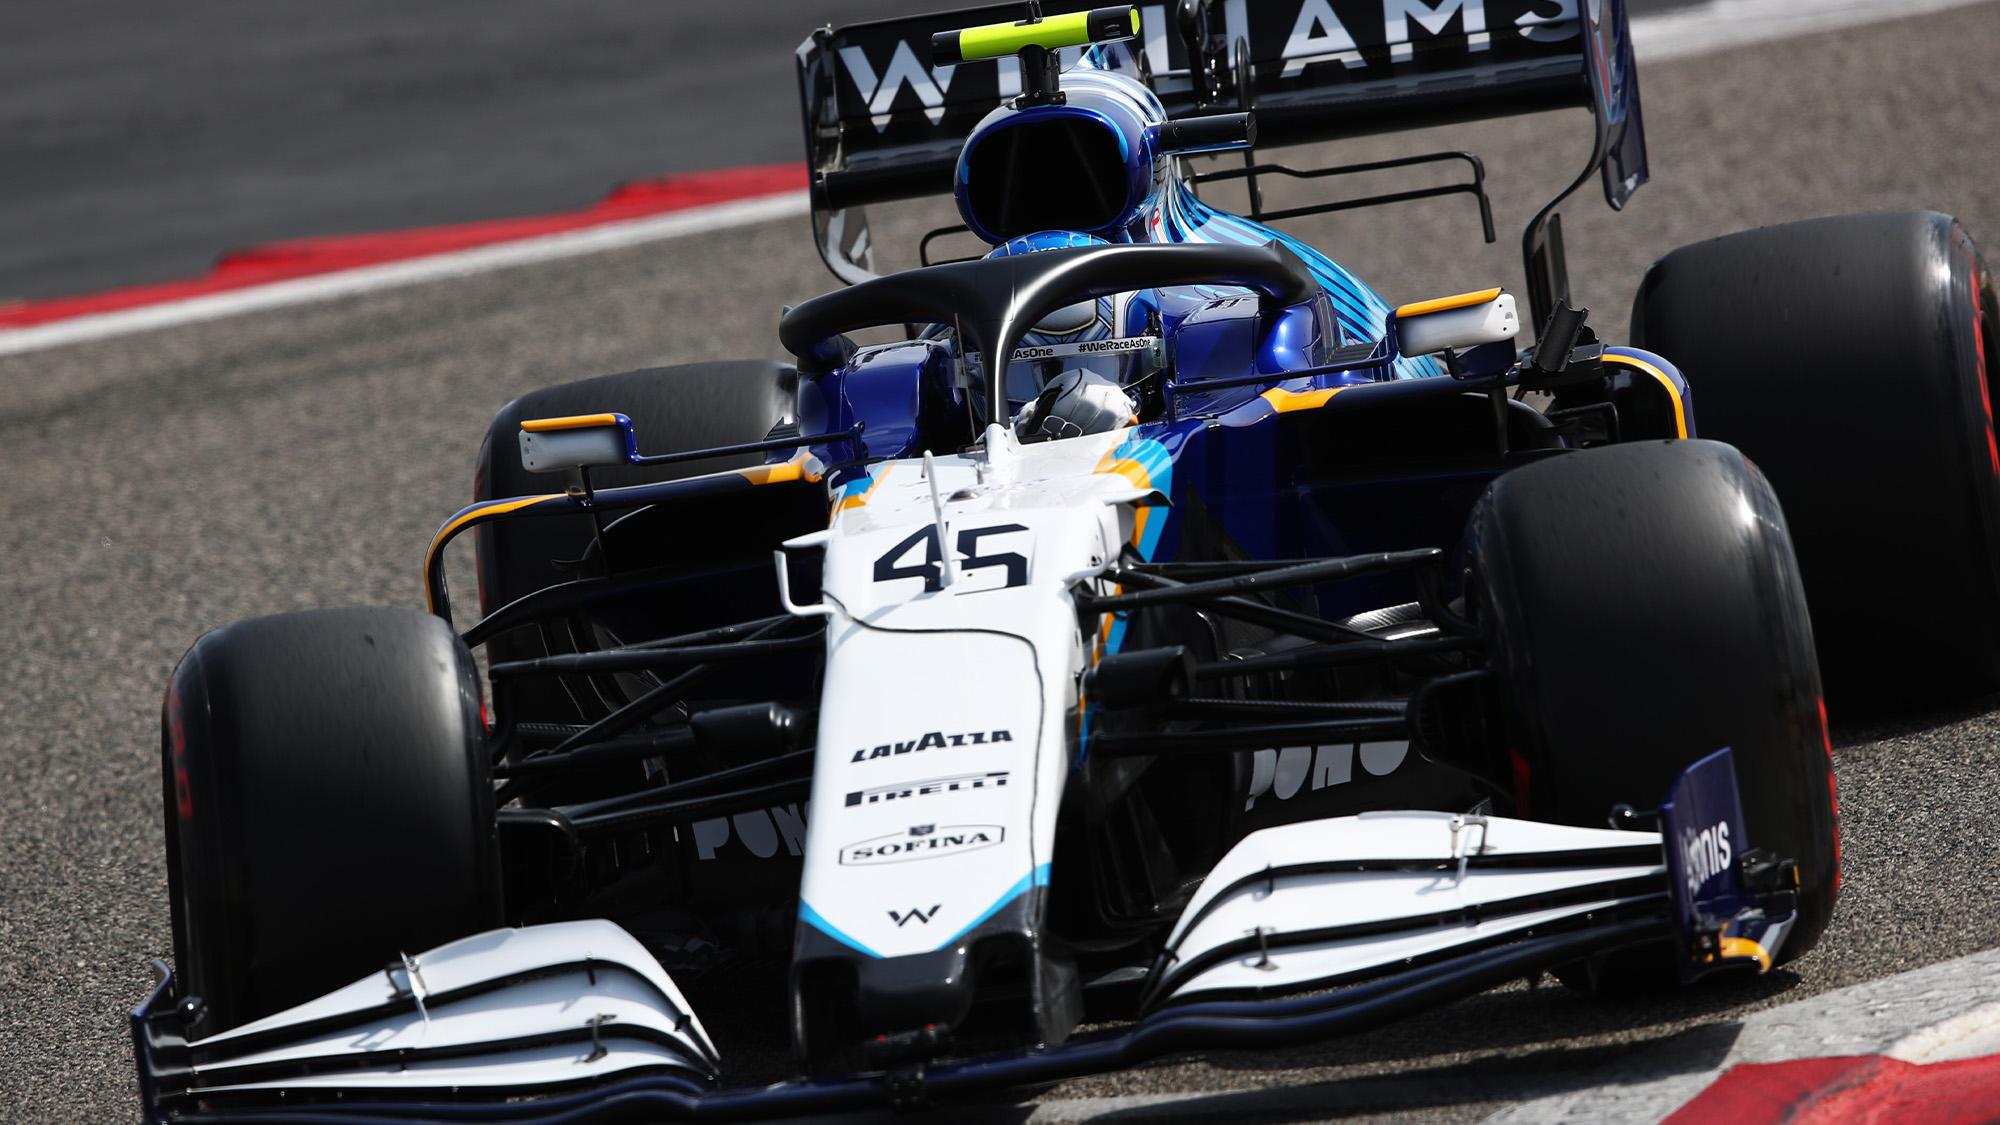 2021 Williams preseason testing